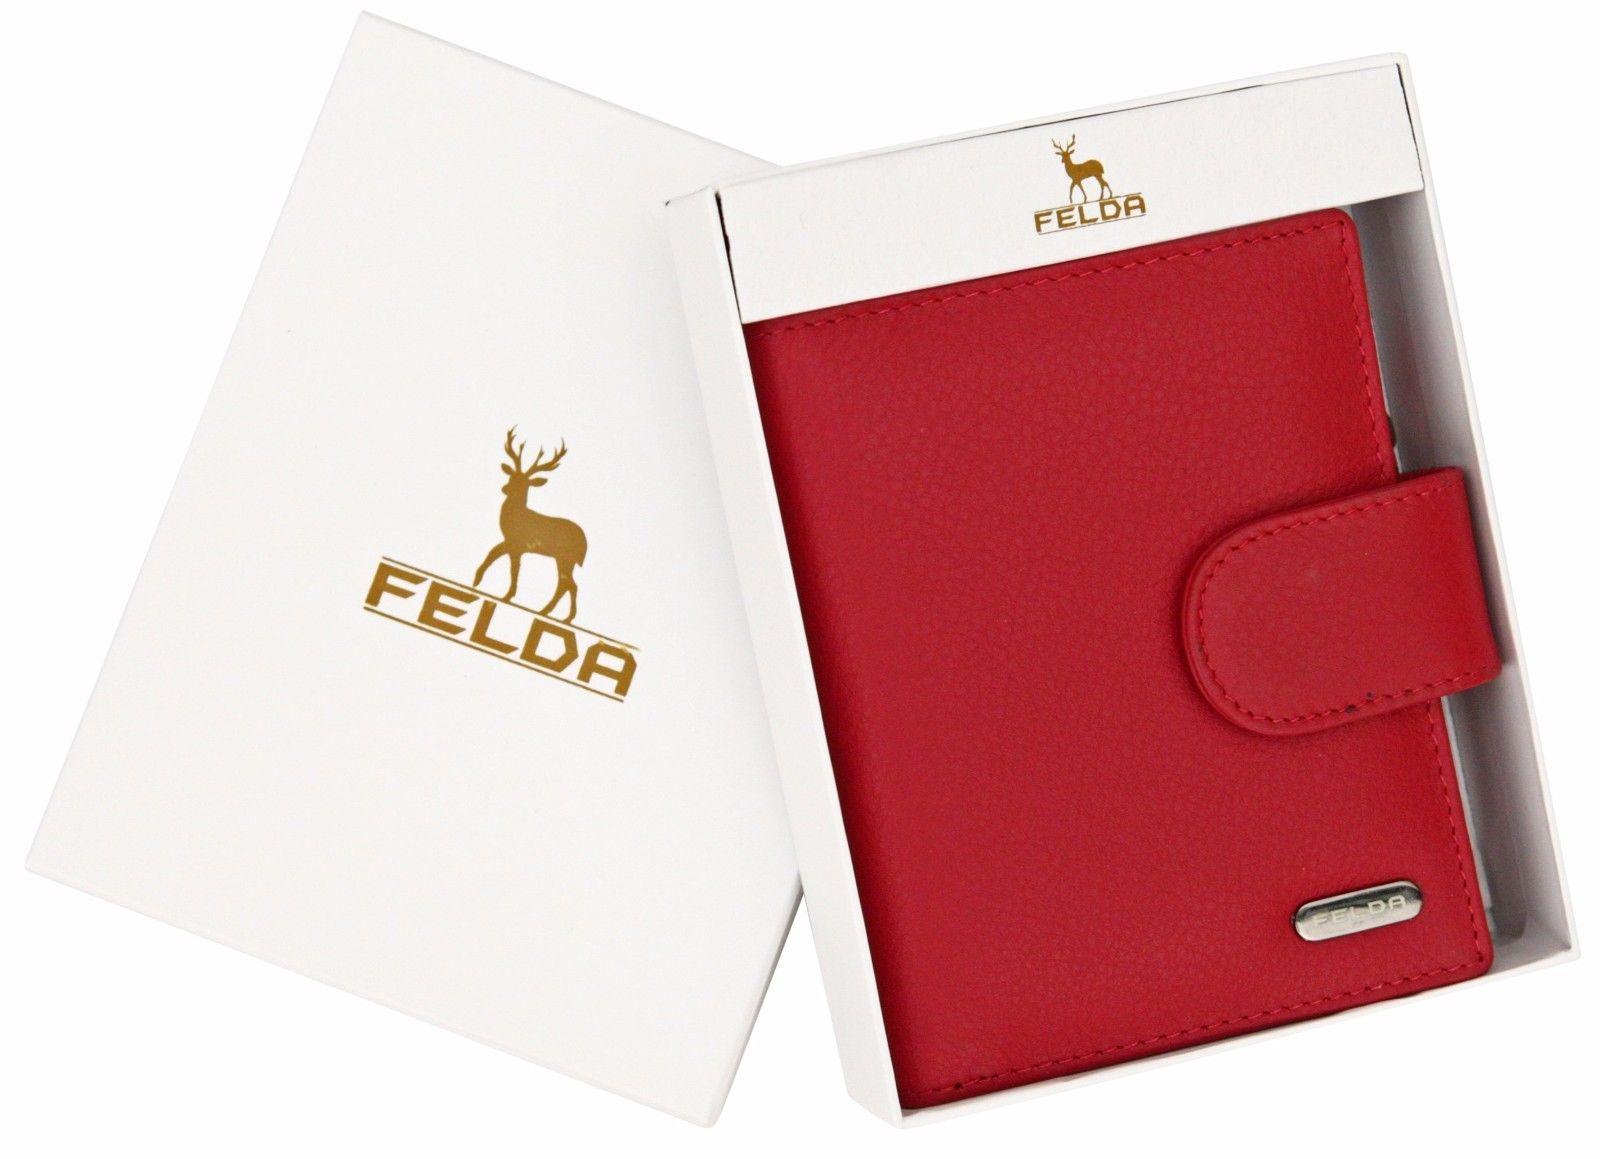 Felda-RFID-onorevoli-MEDAGLIA-amp-Card-Purse-Wallet-Genuine-Leather-Multi-SOFT-BOX-REGALO miniatura 99